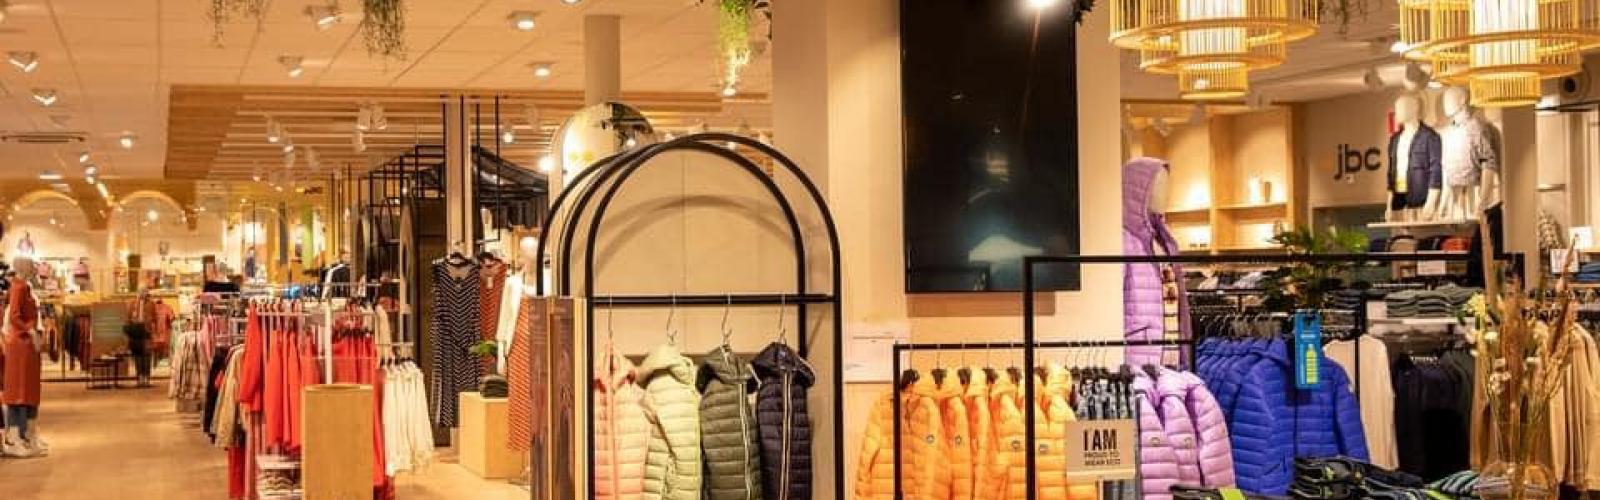 interieur vernieuwde winkel JBC Leuven